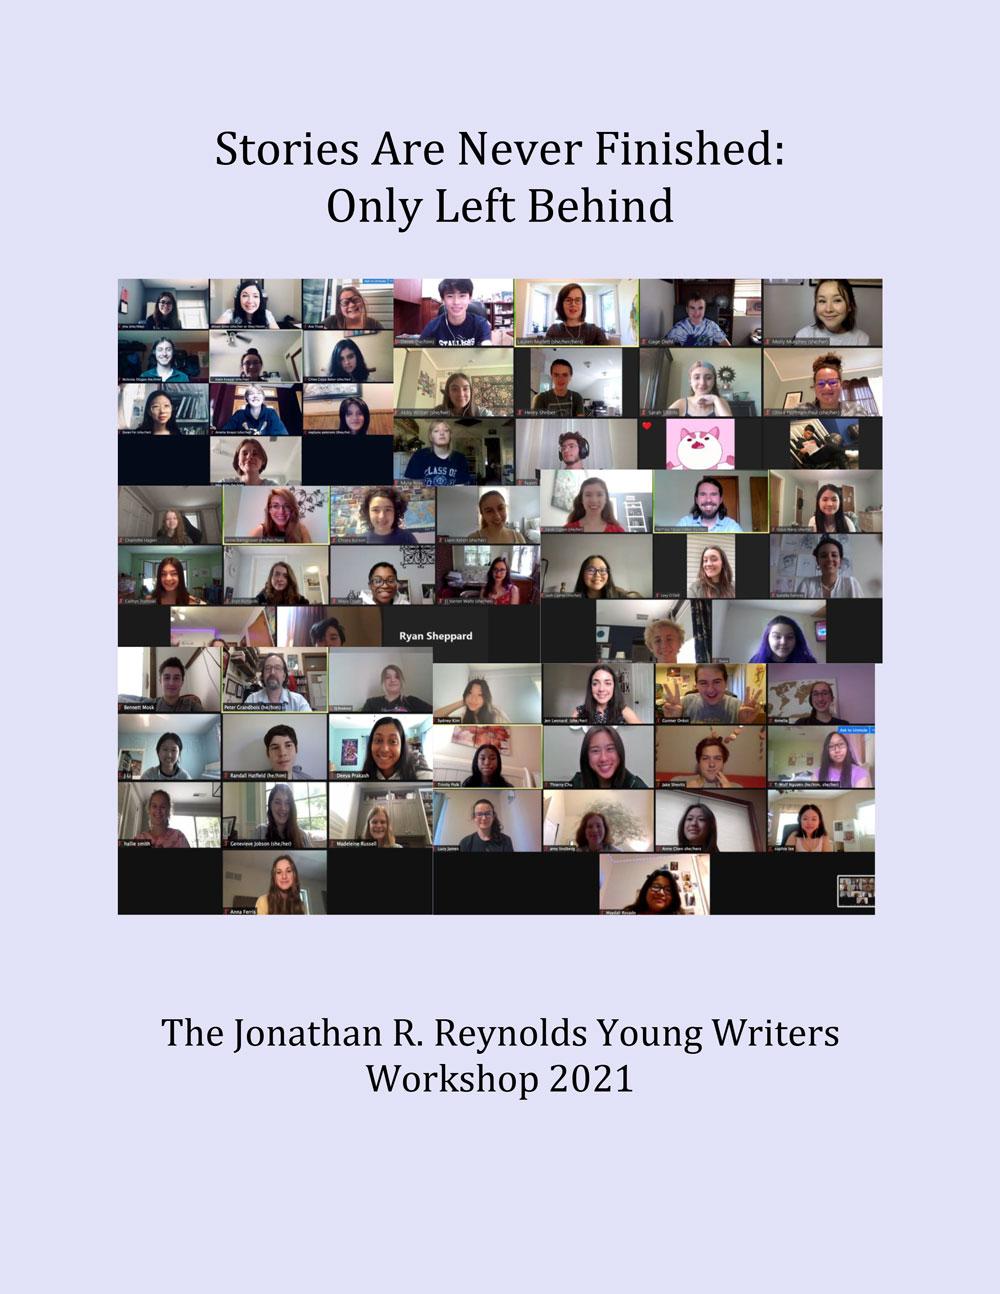 https://issuu.com/denisonuniversity/docs/final_reynolds_anthology_2021